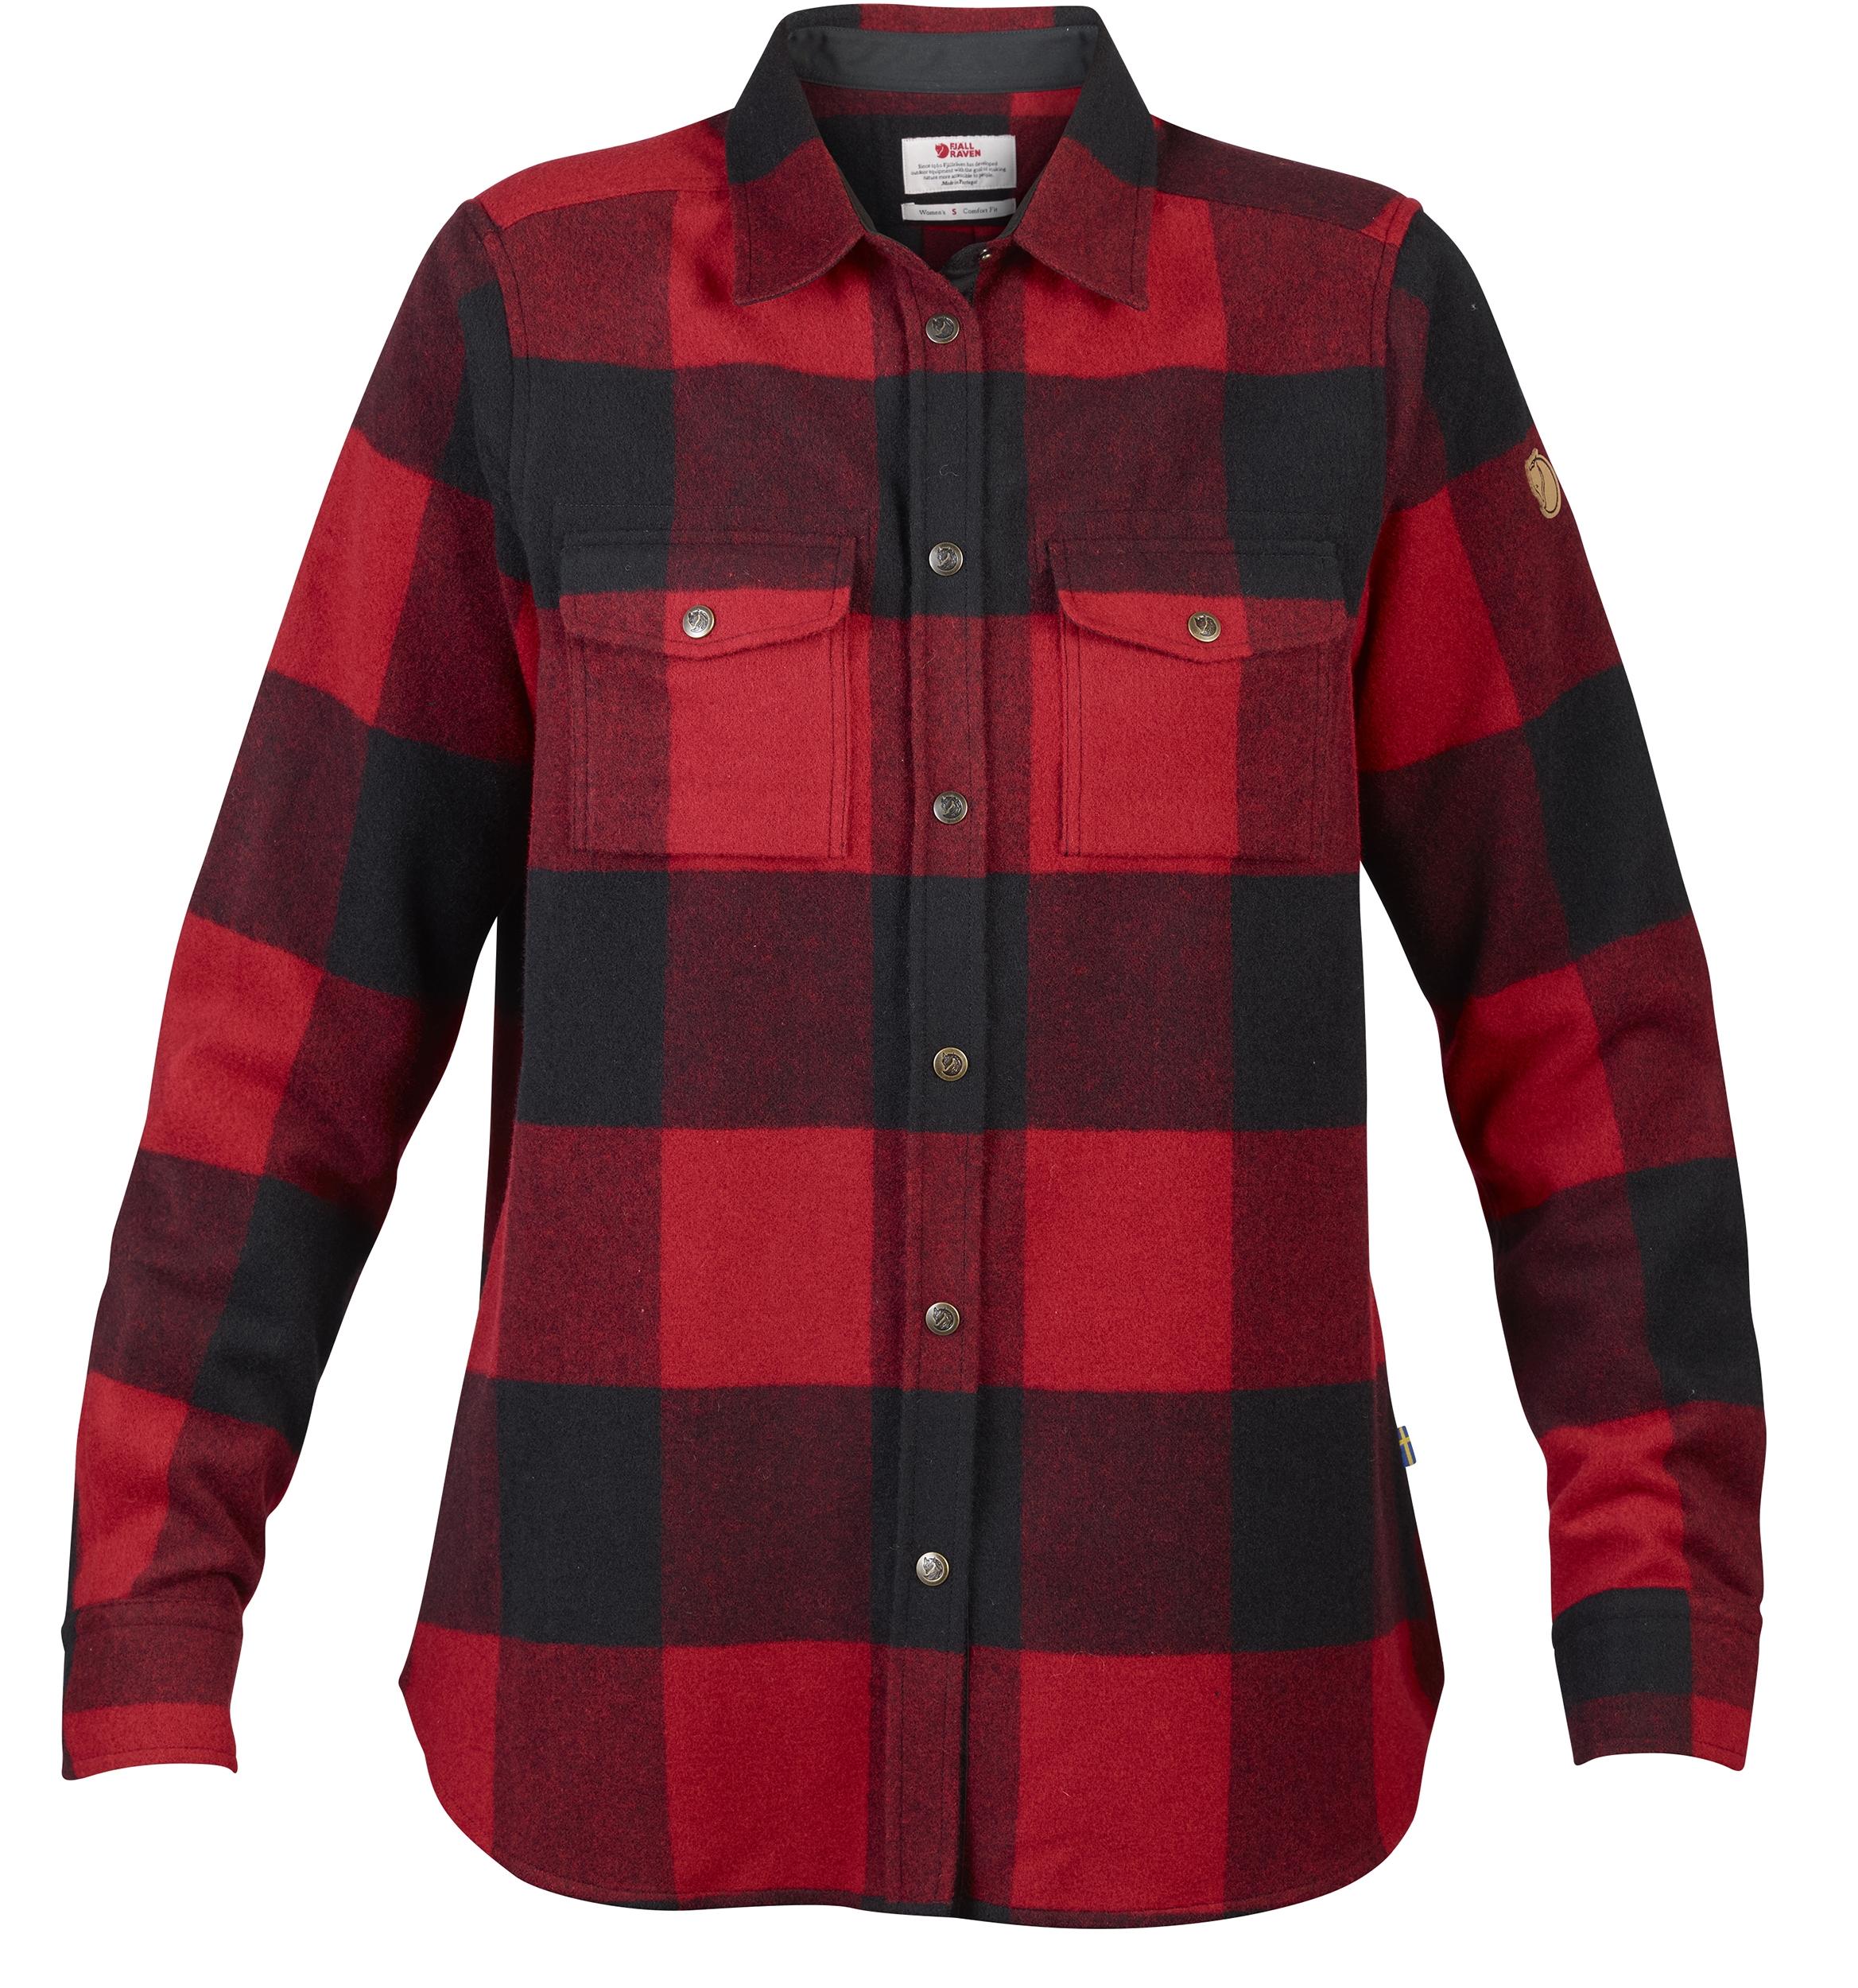 bd00c8459cf Fjällraven Canada Skjorte Lady Rød